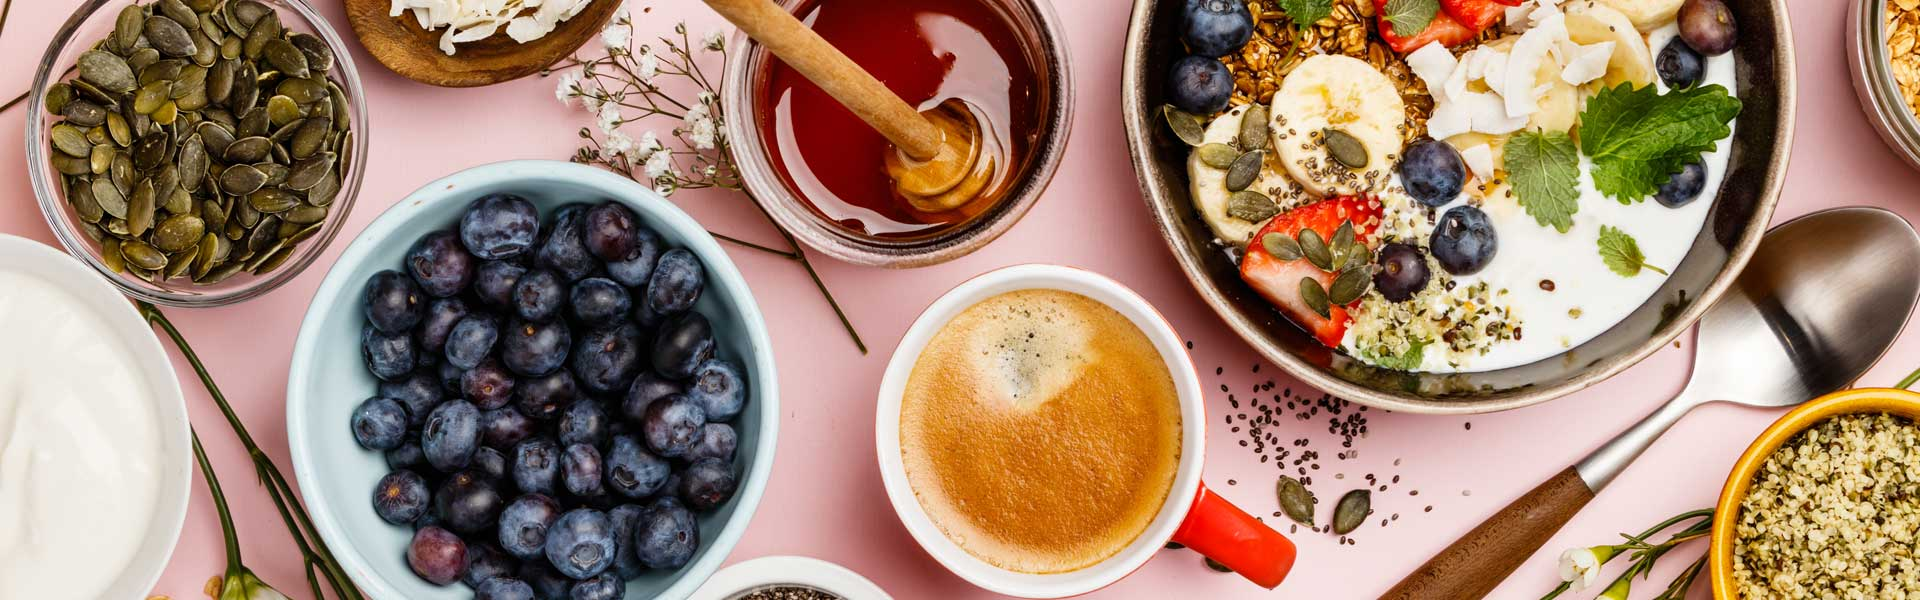 Various fresh foods and berries